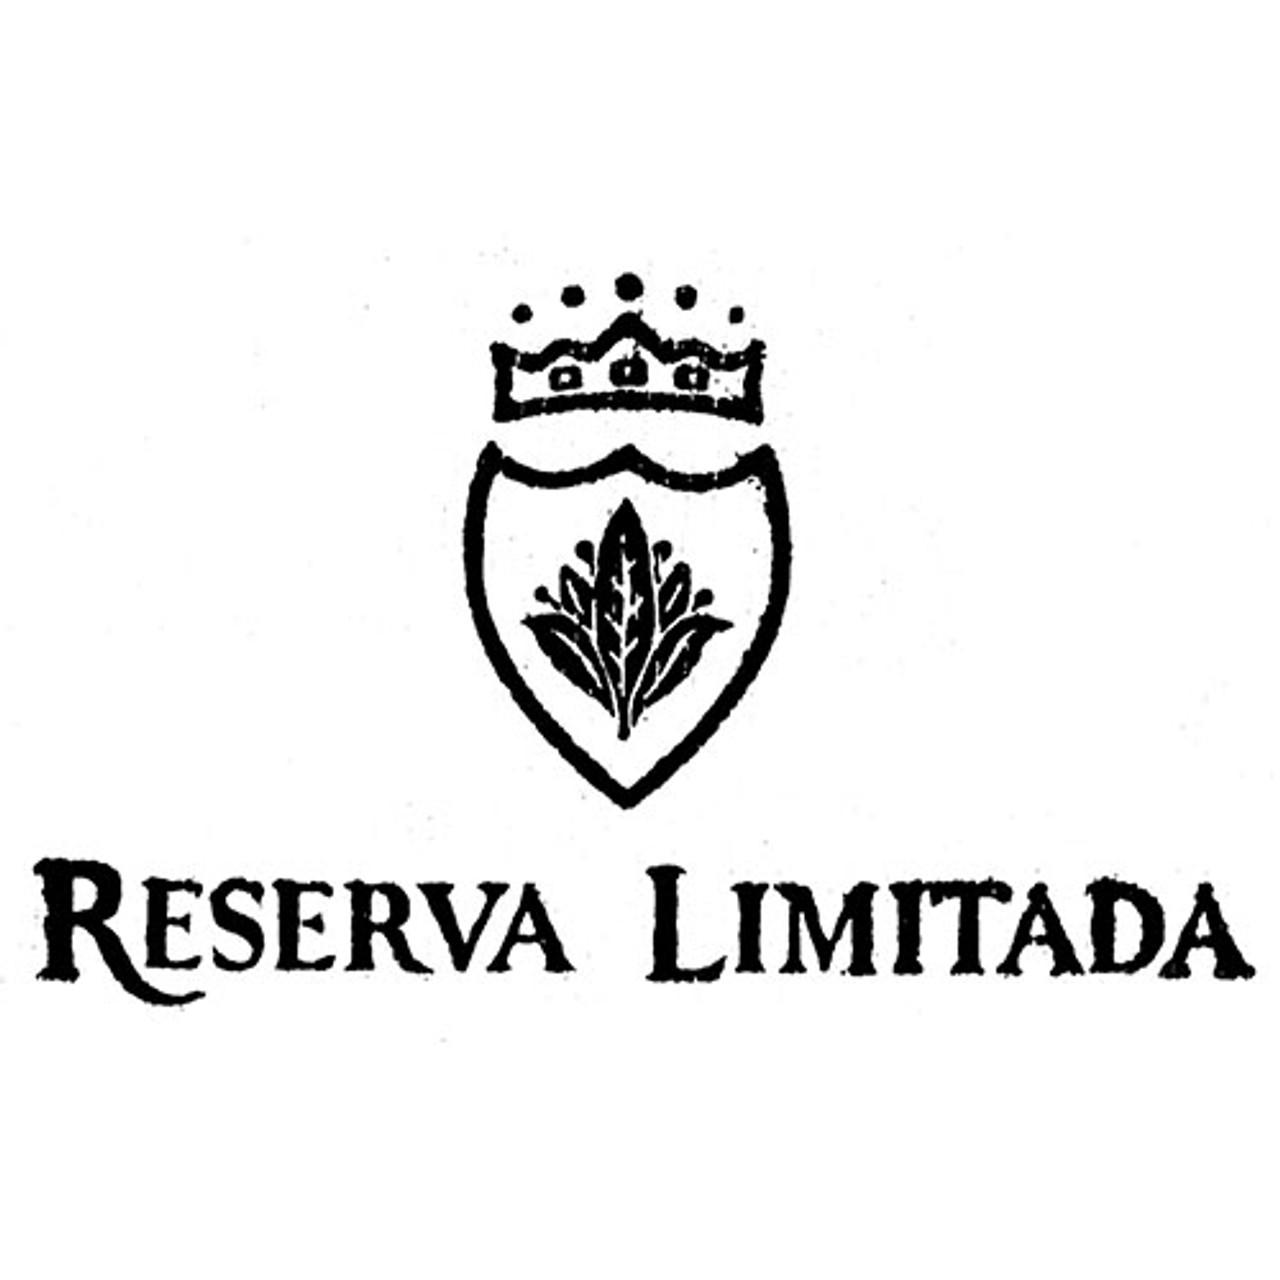 Curivari Reserva Limitada 1000 Series Reserva 2000 Cigars - 5 x 50 (Box of 10)